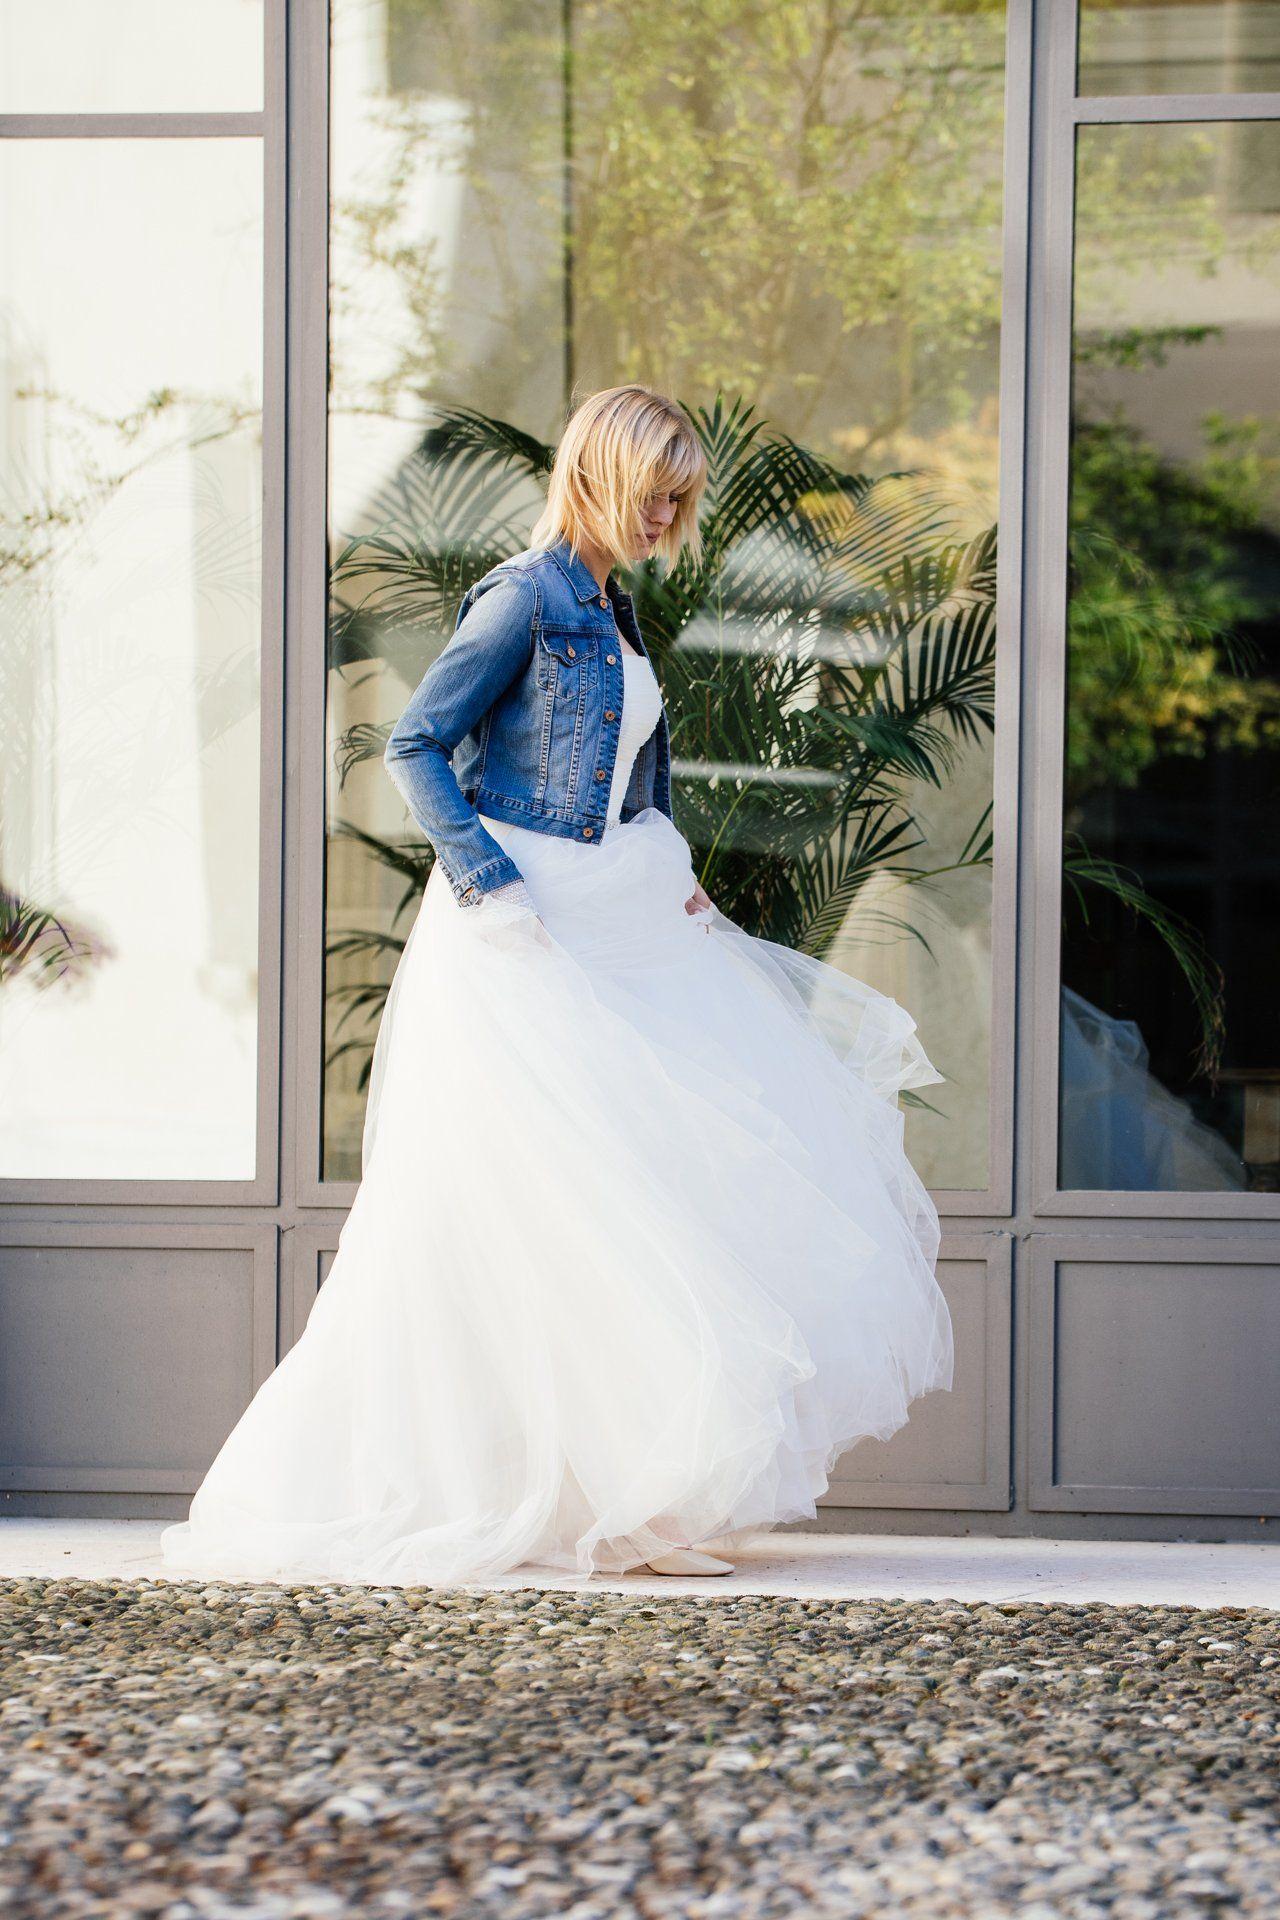 Jeansjacke zum Brautkleid | noni